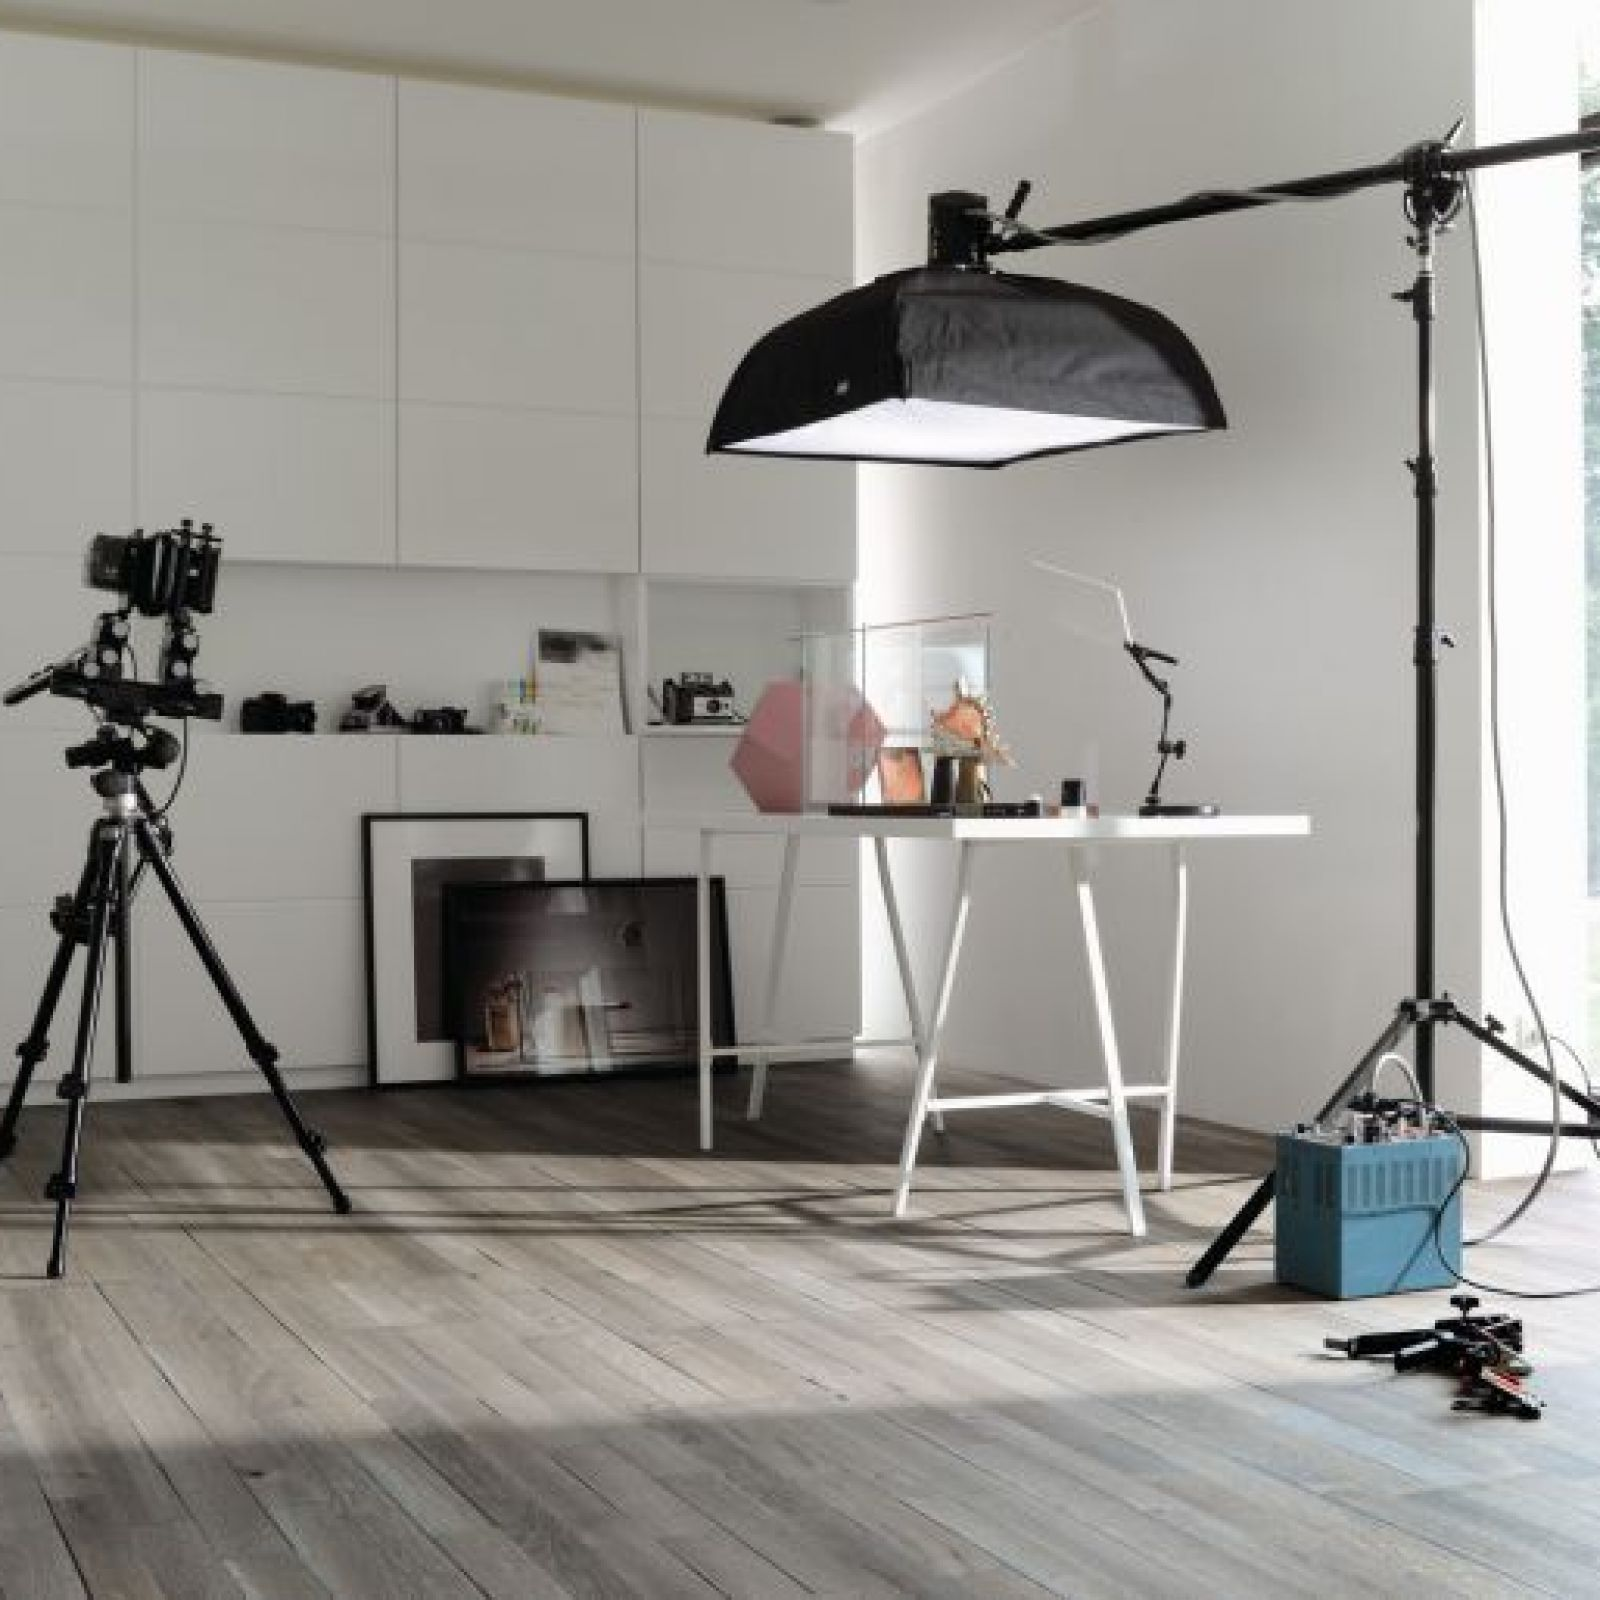 Referral Cleaning Restoration: Toncam Flooring & Interiors :: Kingussie